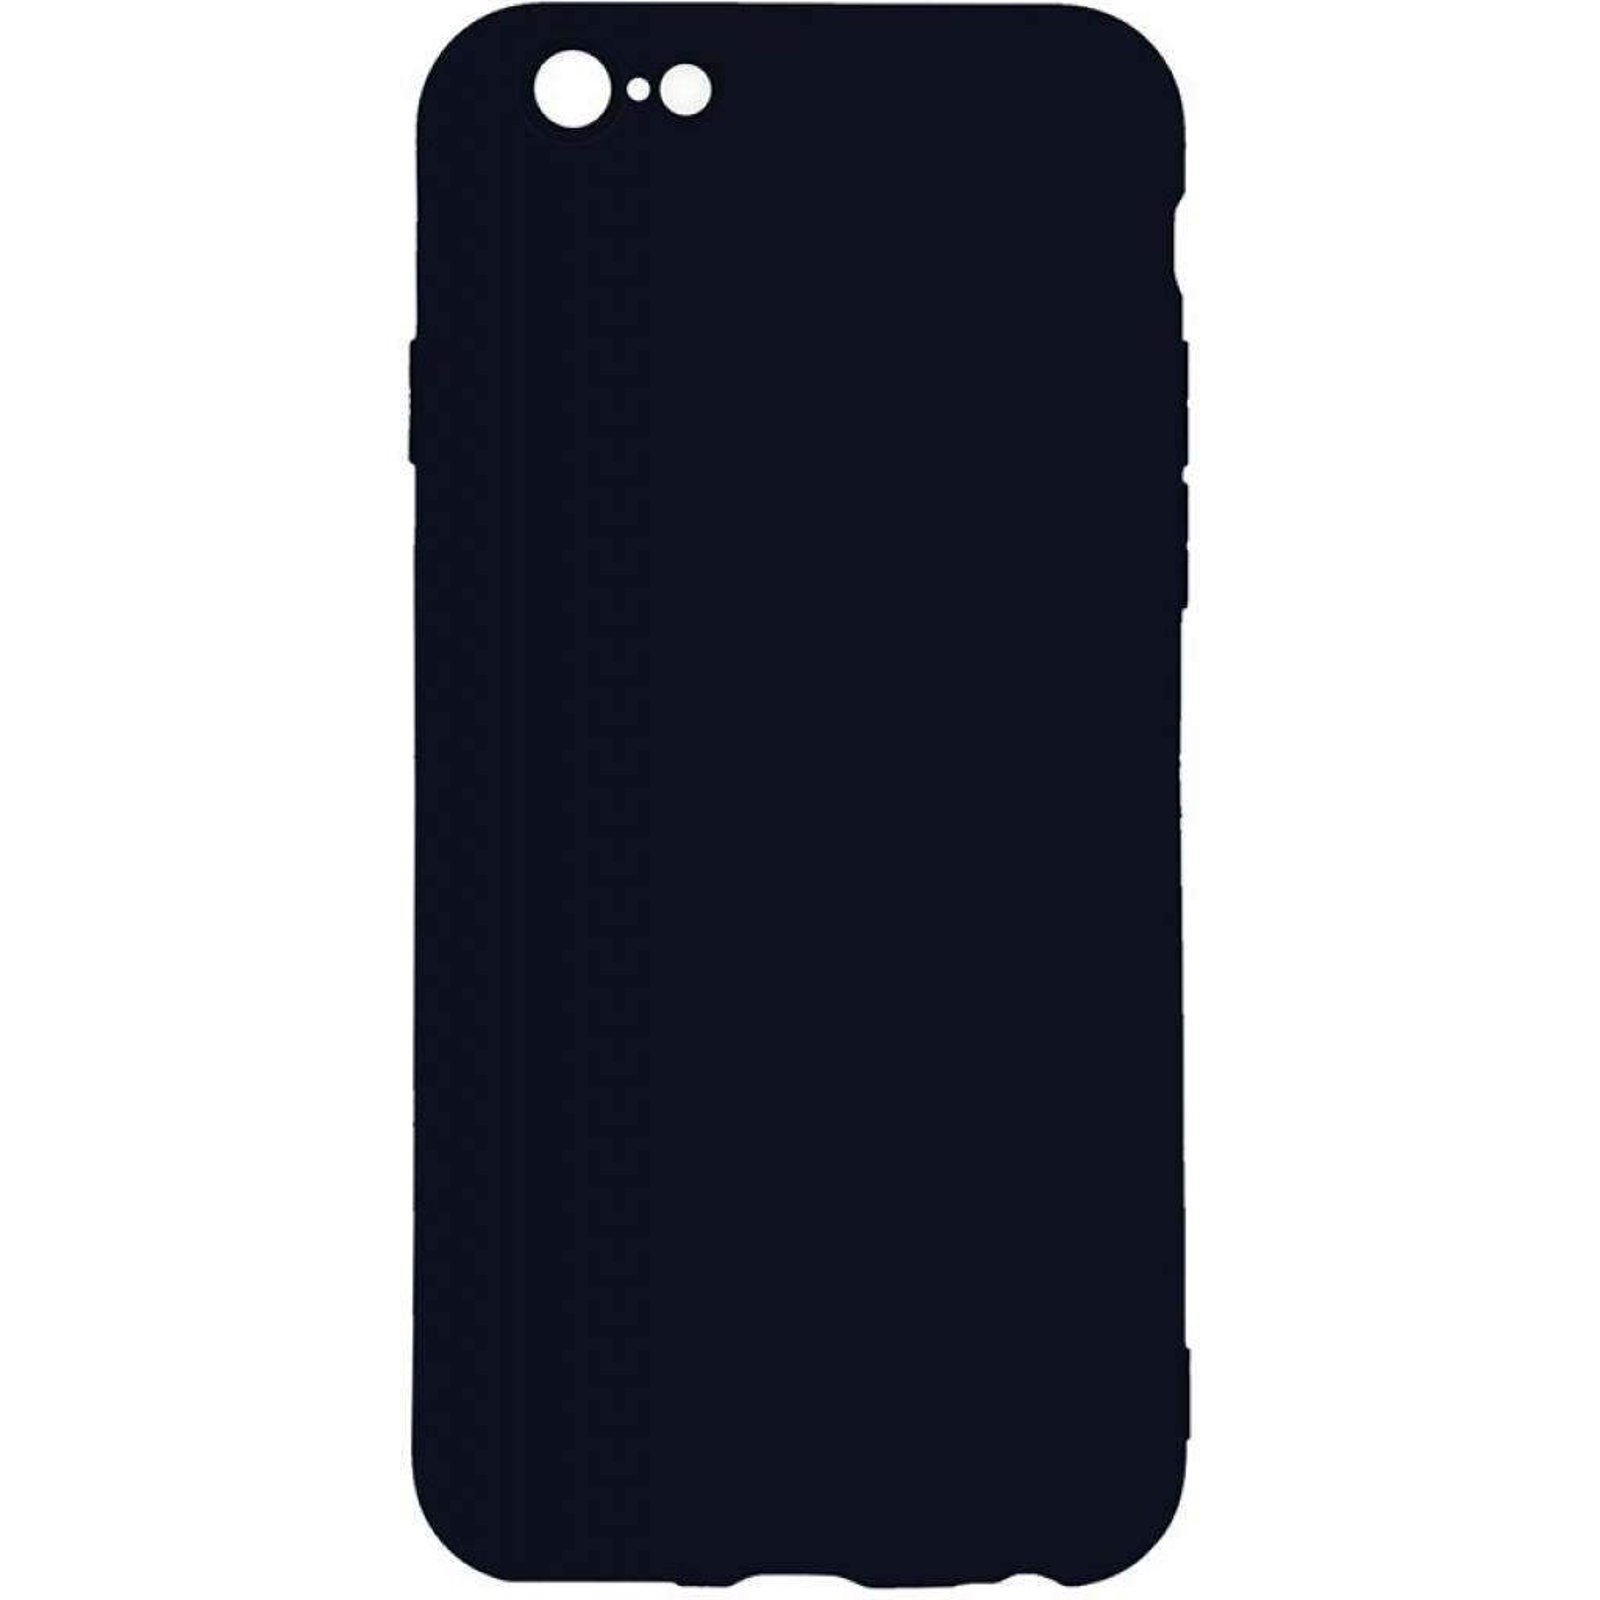 Чехол для моб. телефона Toto 1mm Matt TPU Case Apple iPhone 6 Plus/6s Plus Black (F_93932)